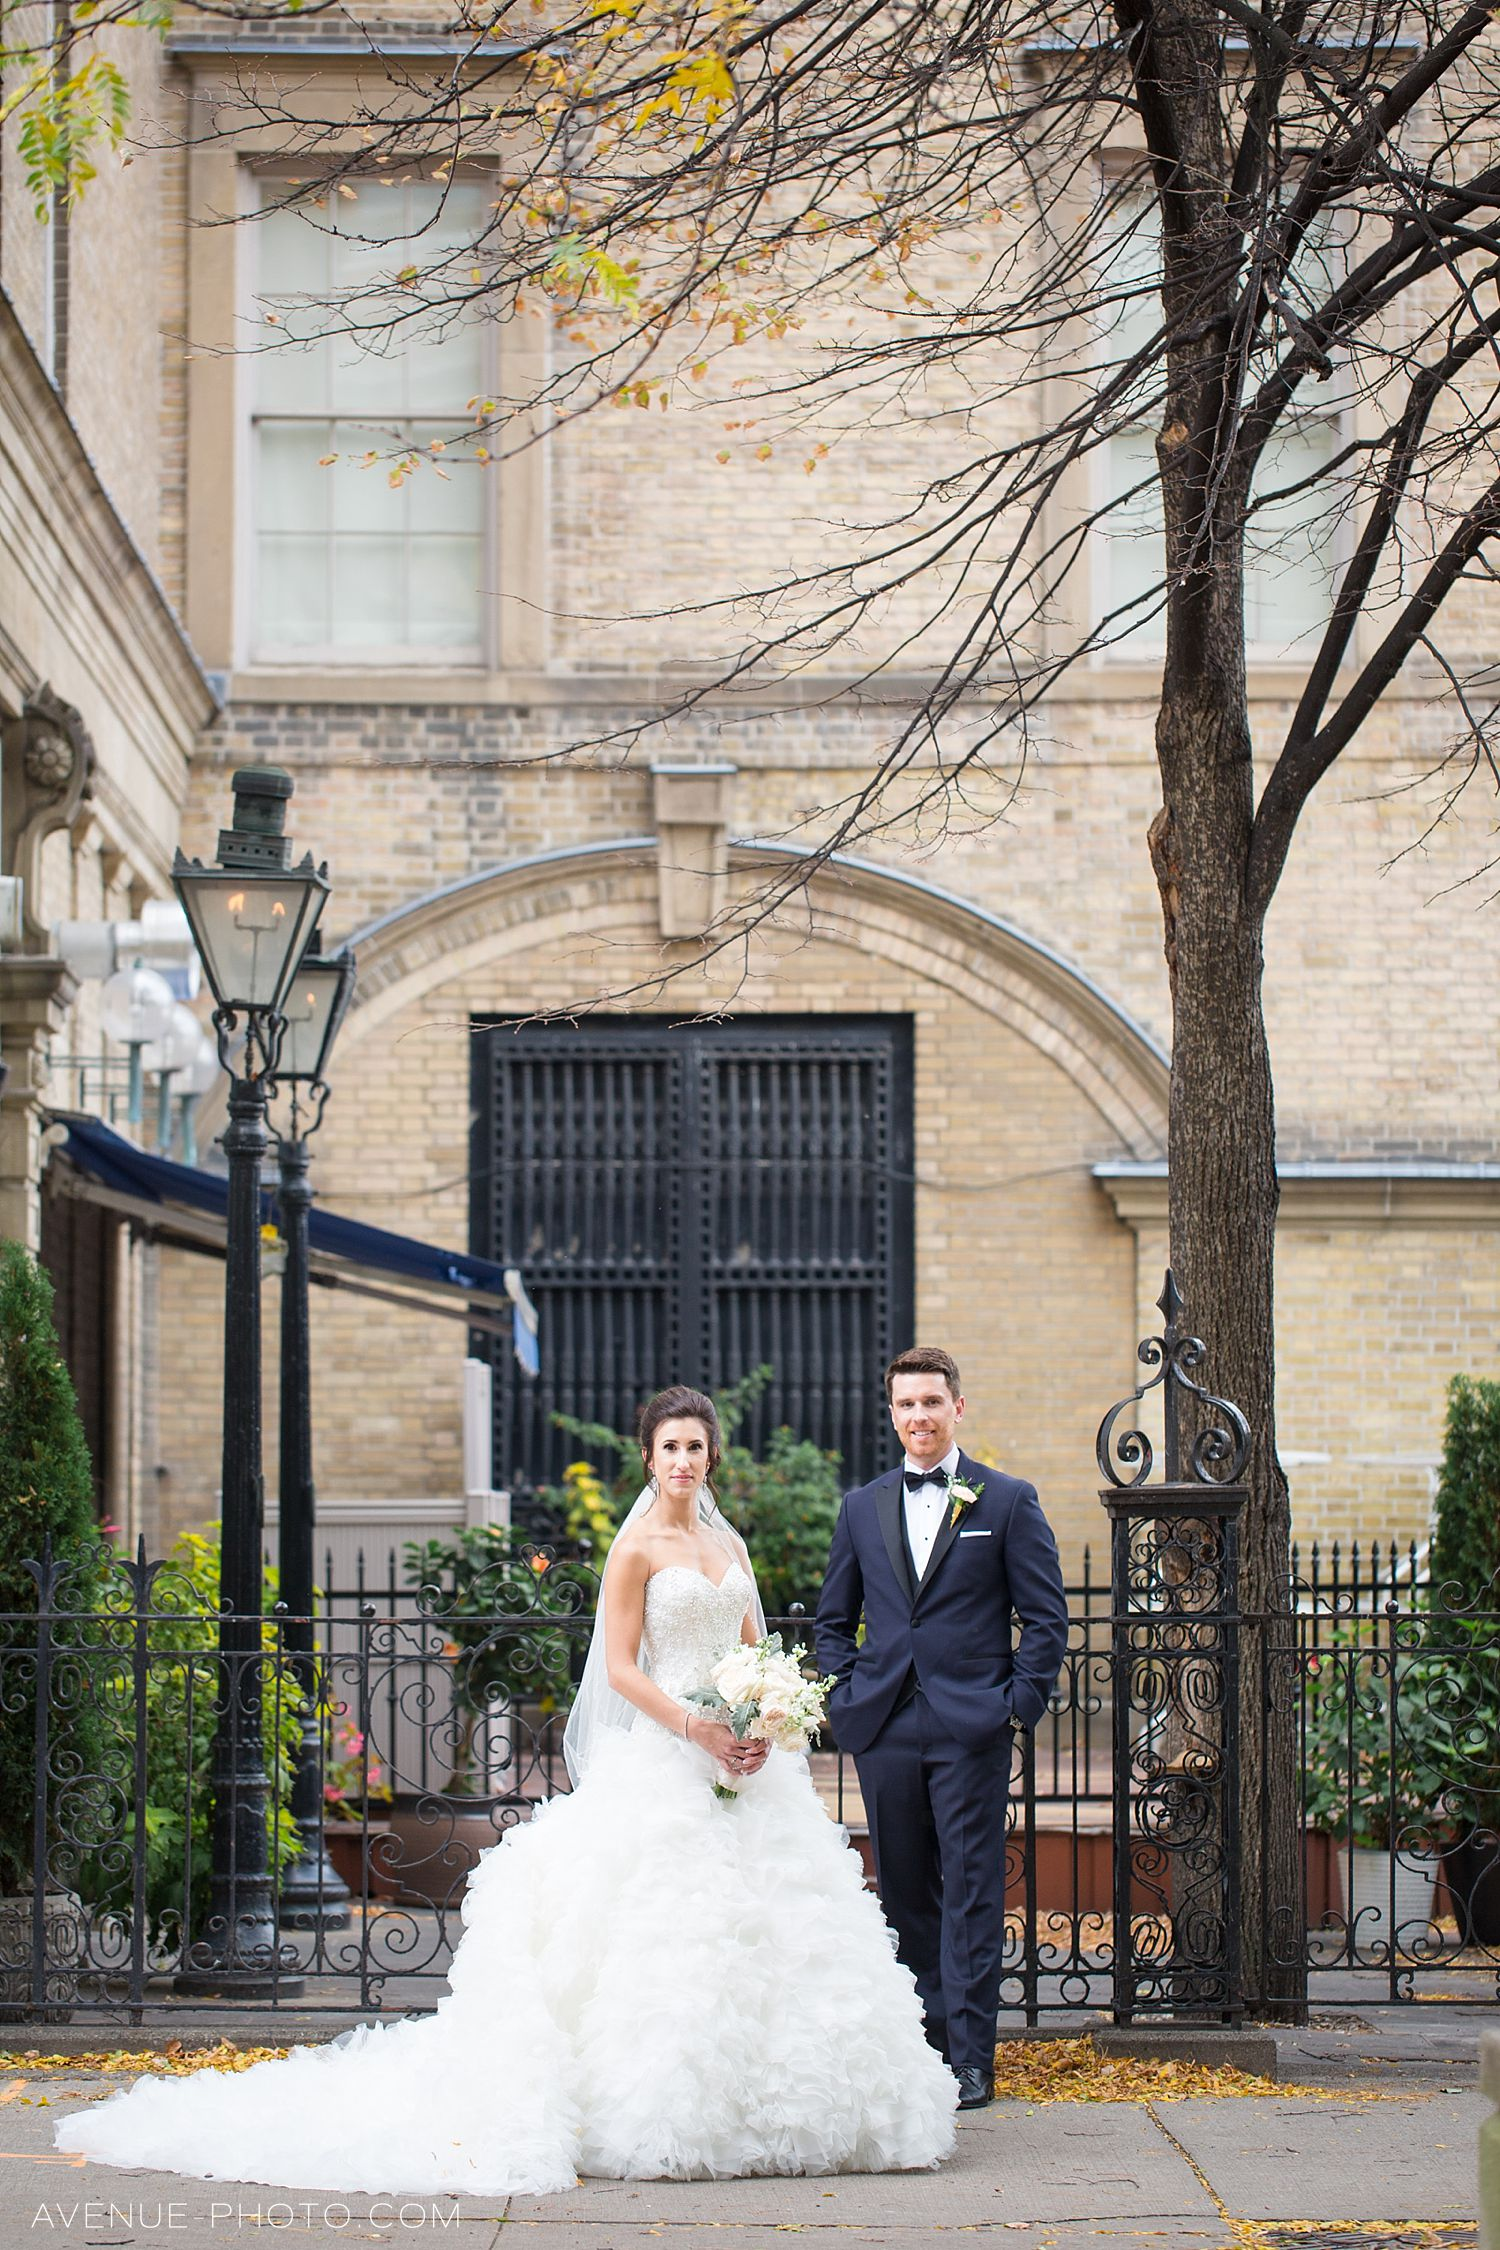 Rosewater Room Wedding Photos Sj Avenuephoto 032 Toronto Wedding Photographer Avenue Photo